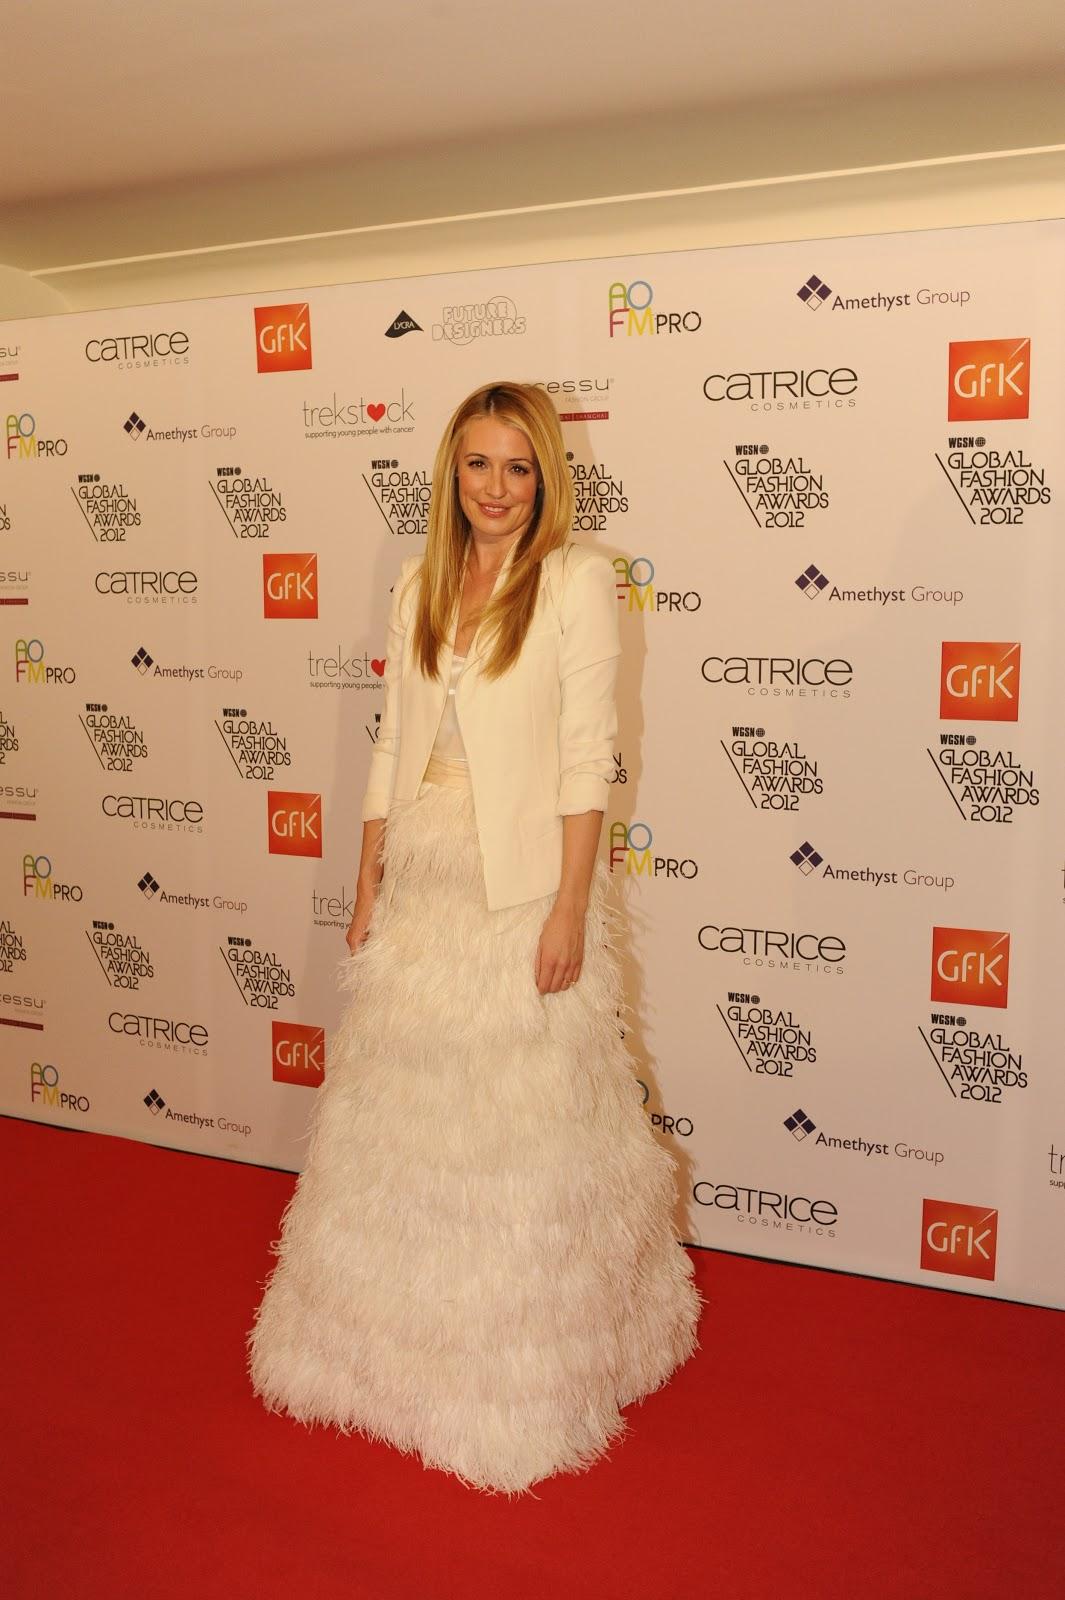 WGSN Global Fashion Awards Ceremony 2012